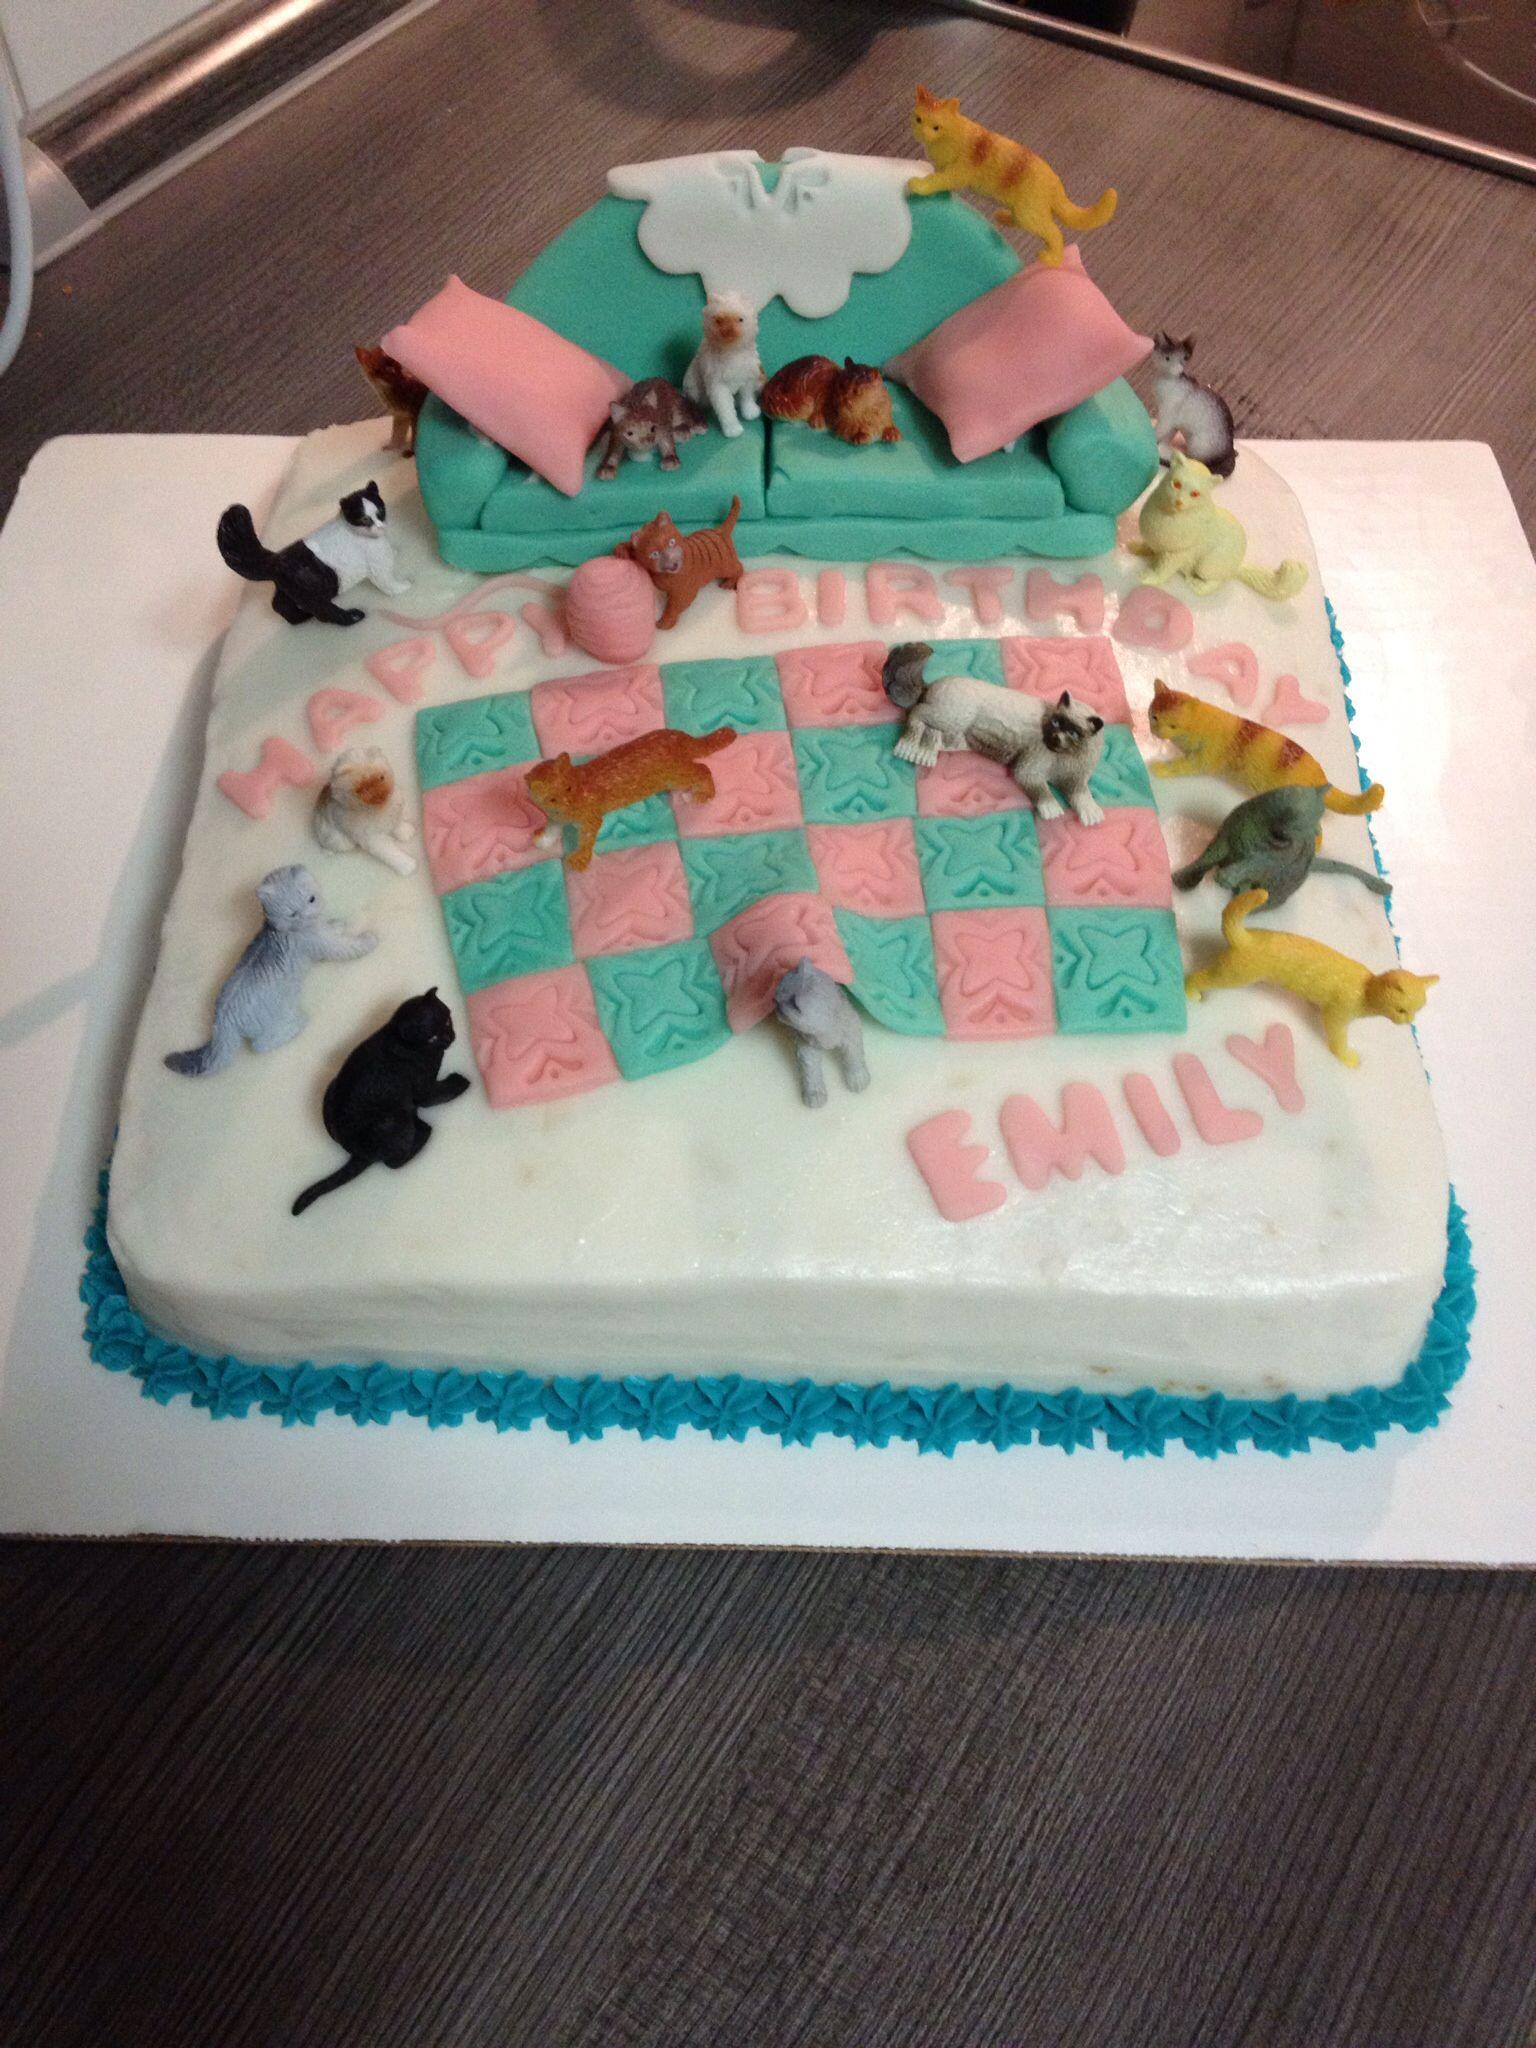 Crazy cat lady cakeMade by Melia Healy Cherrys Treats